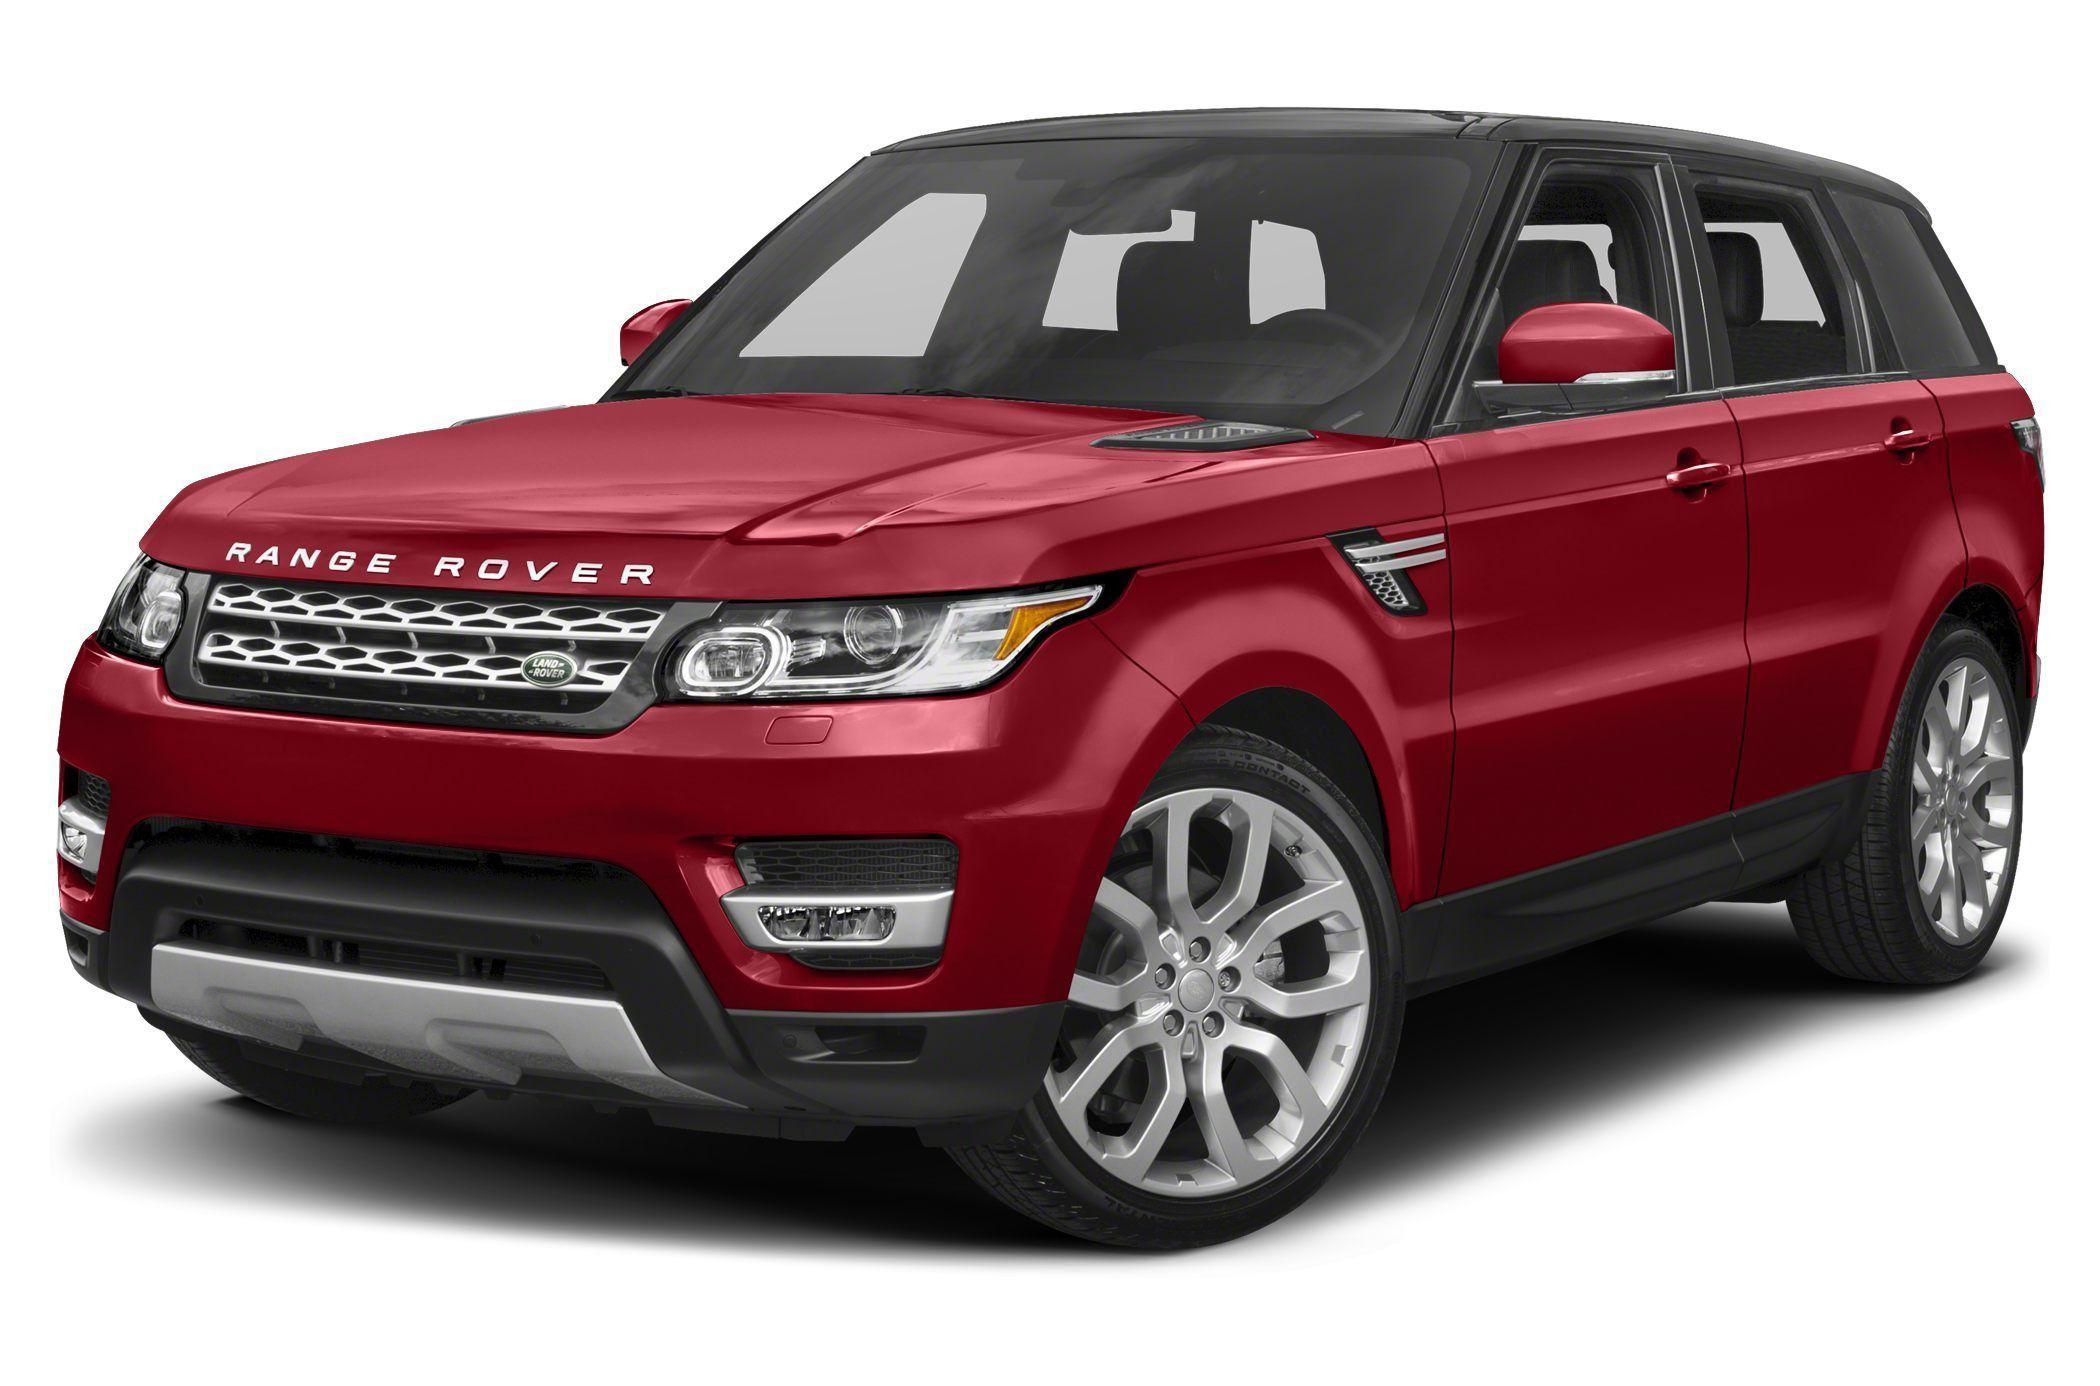 2018 Range Rover Sport #pinkrangerovers 2018 Range Rover Sport #pinkrangerovers 2018 Range Rover Sport #pinkrangerovers 2018 Range Rover Sport #pinkrangerovers